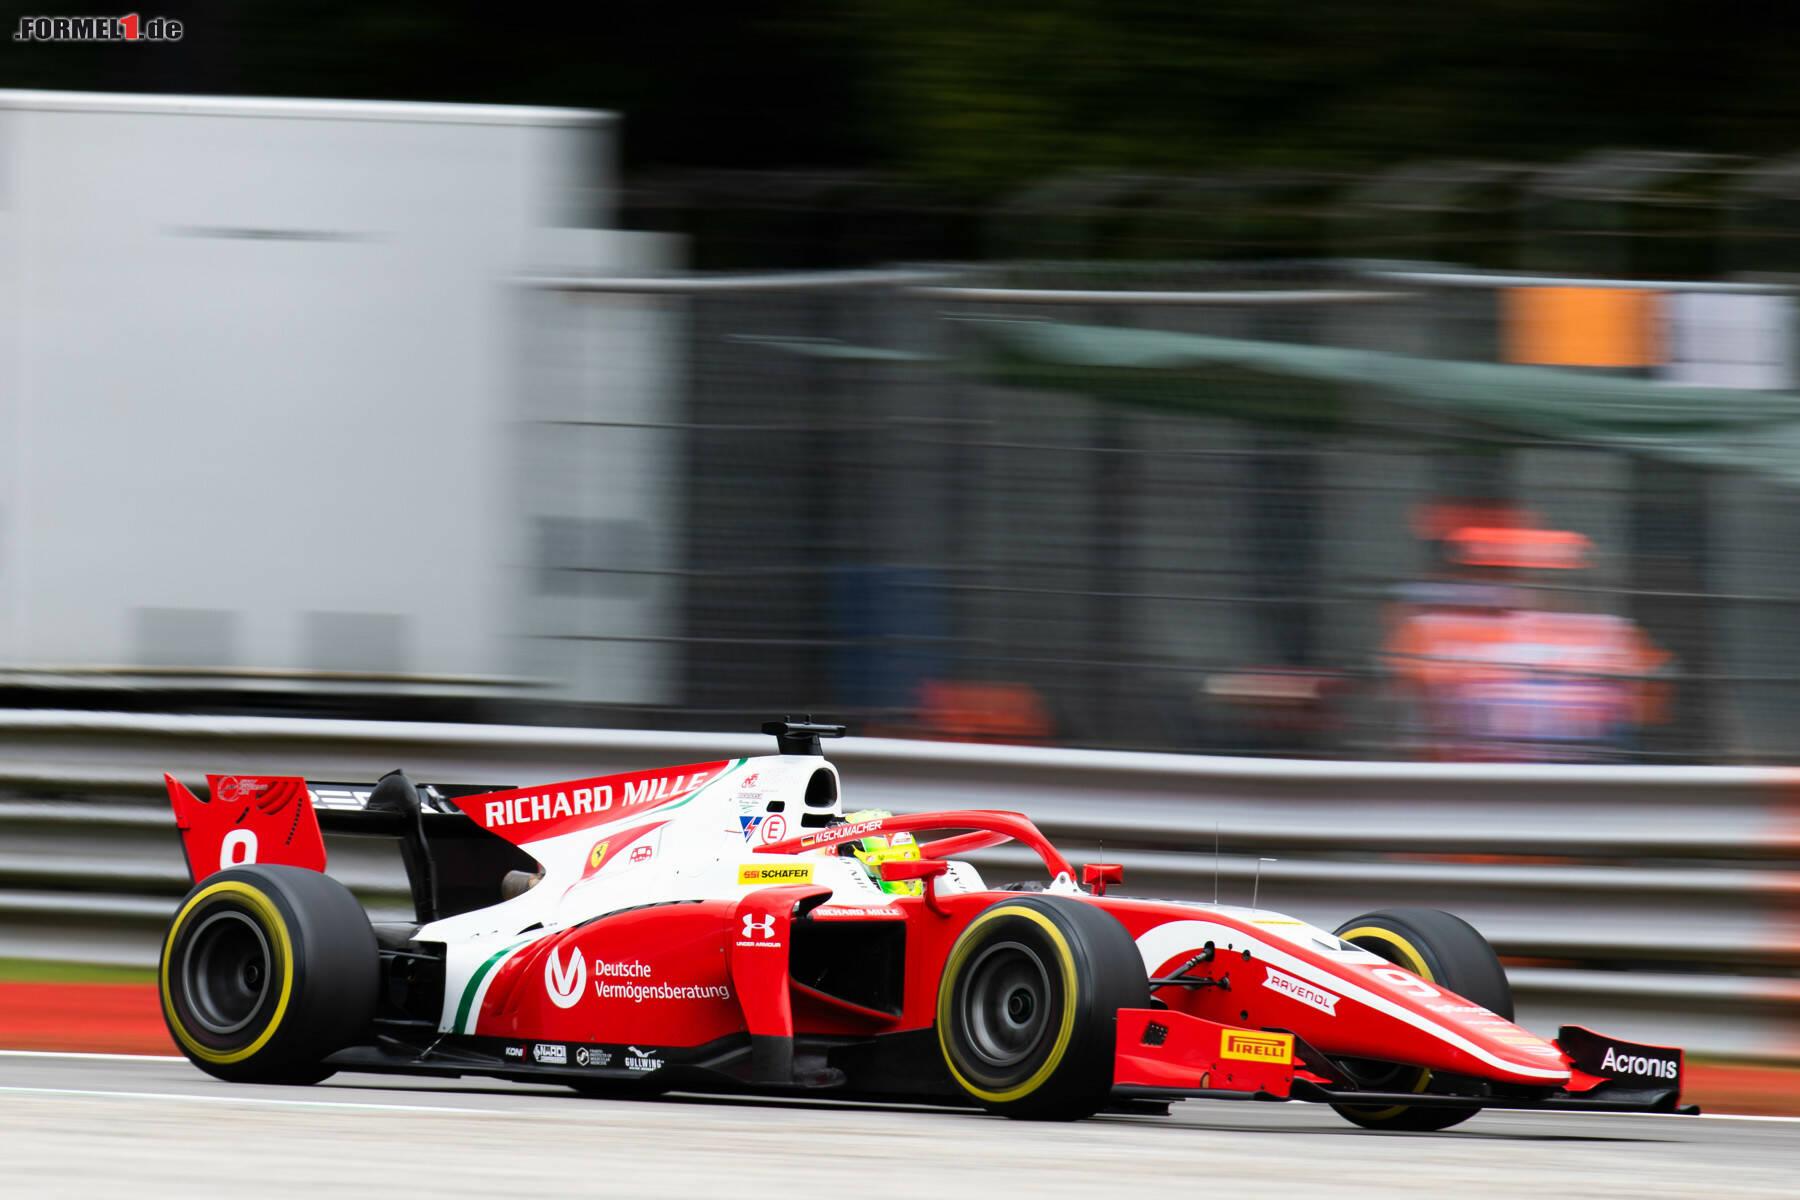 Formel 1 Monza Qualifying